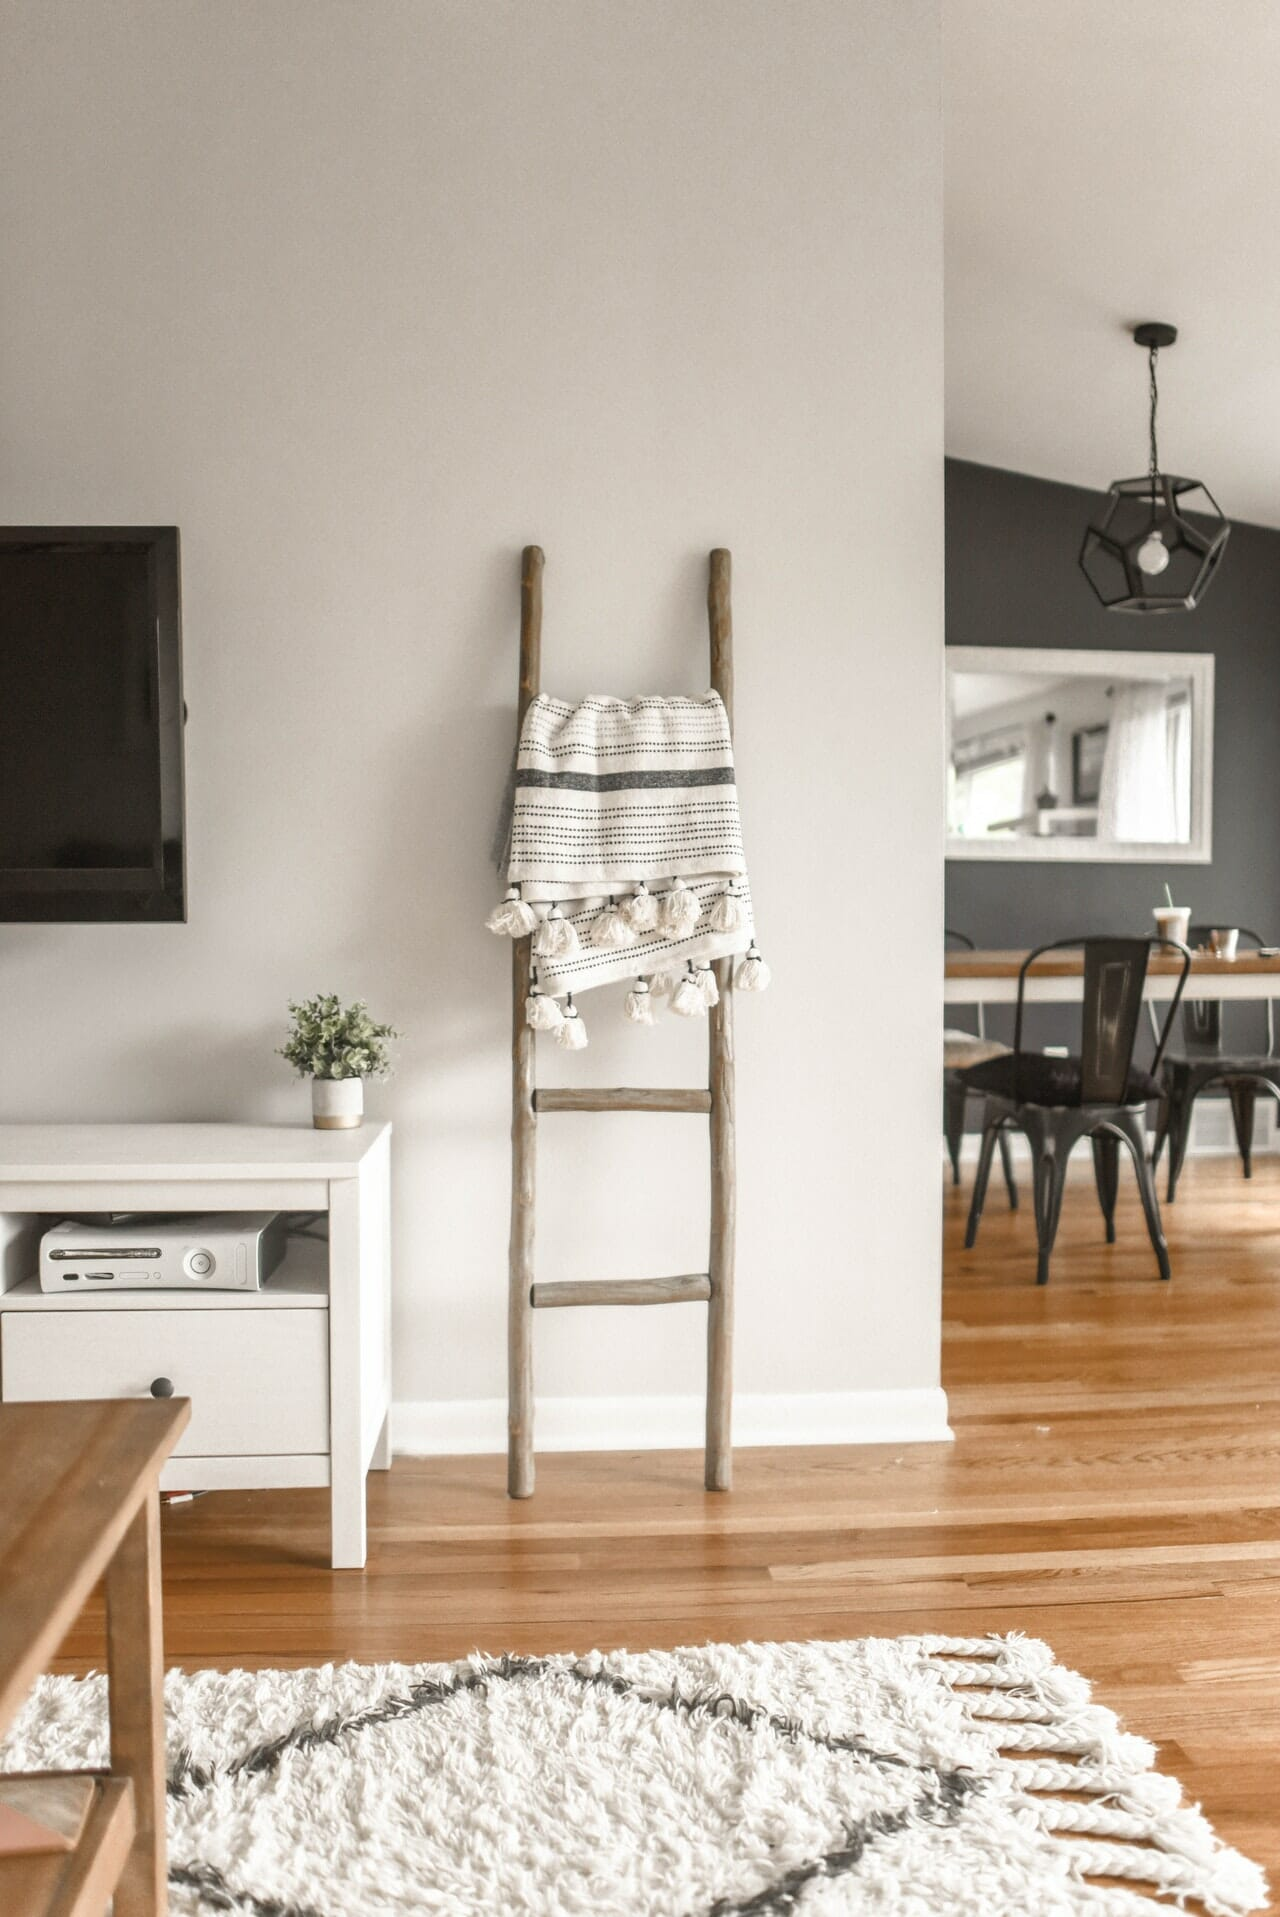 airbnb covid-19, airbnb coronavirus, short-term rental covid-19, cleaning